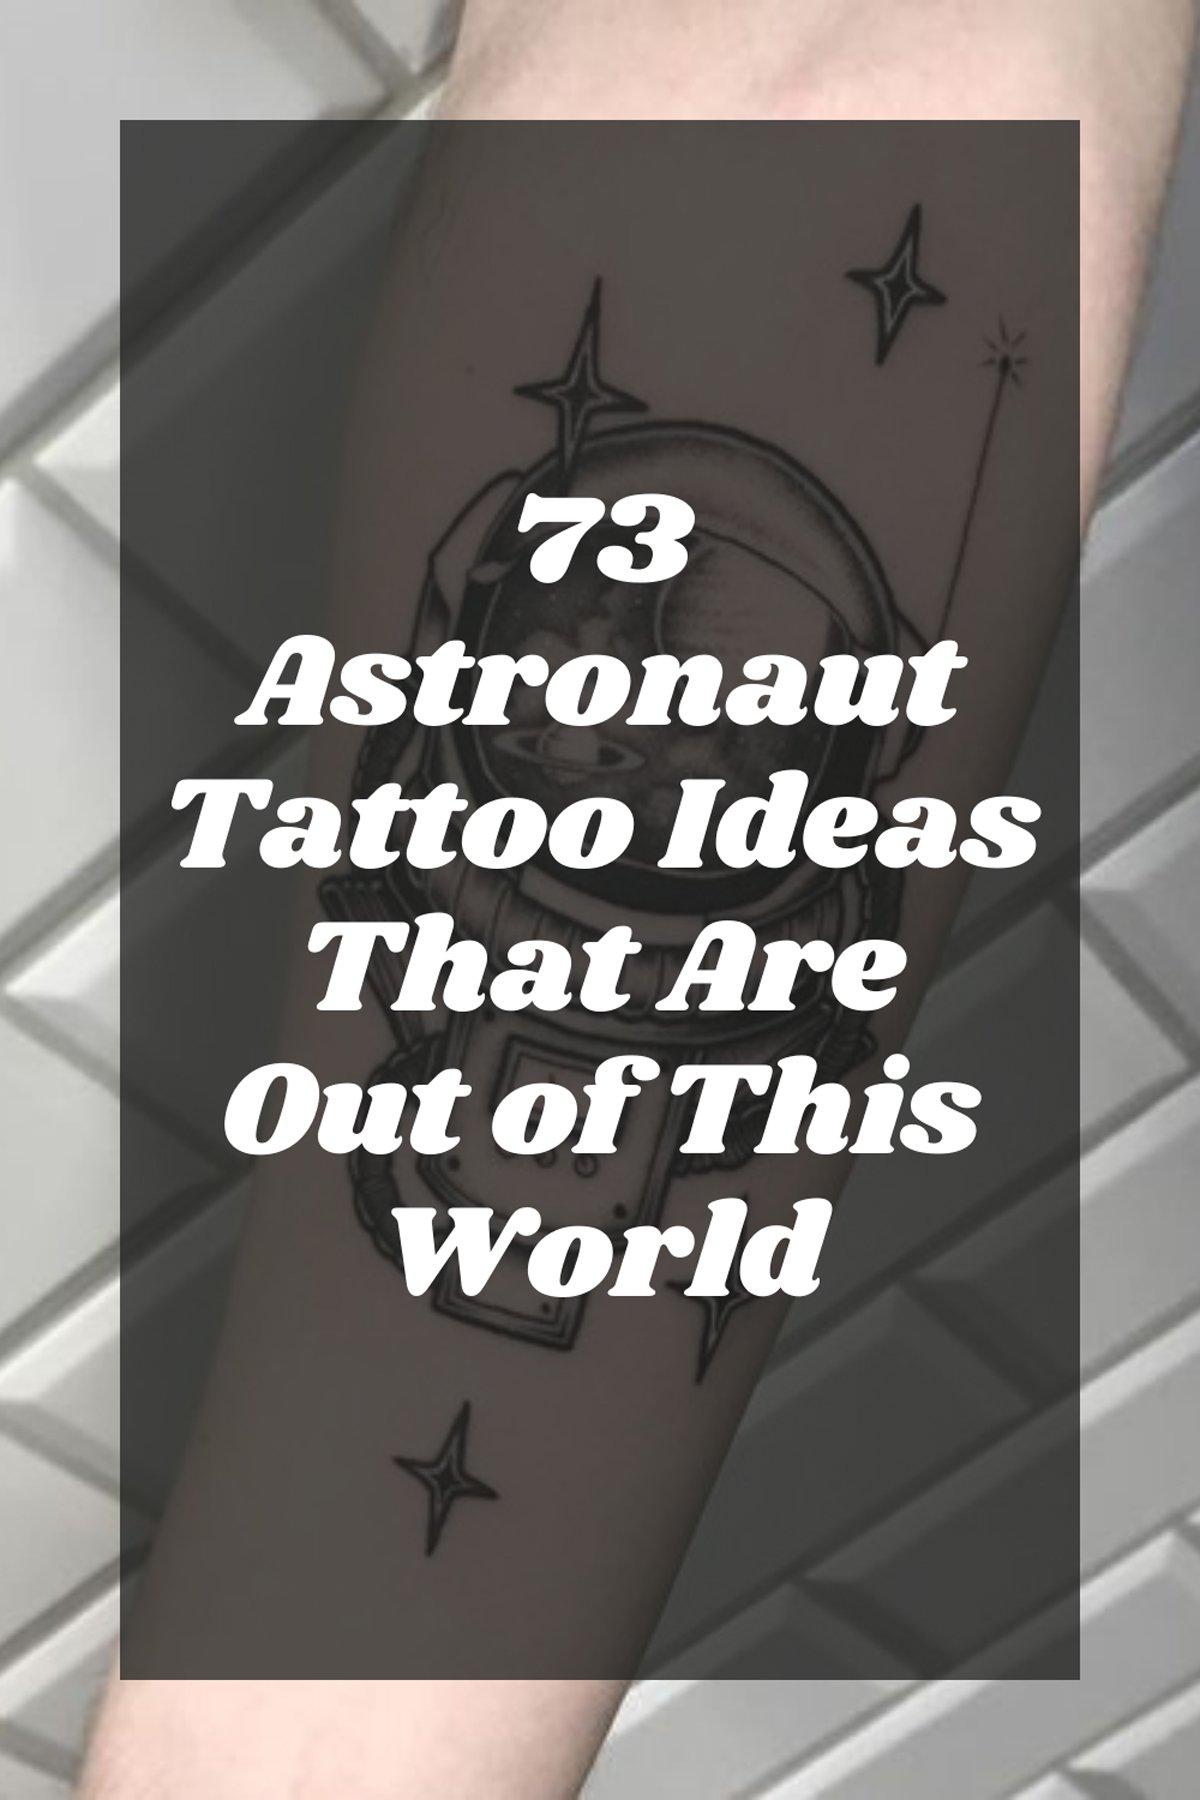 Spaceman Tattoo